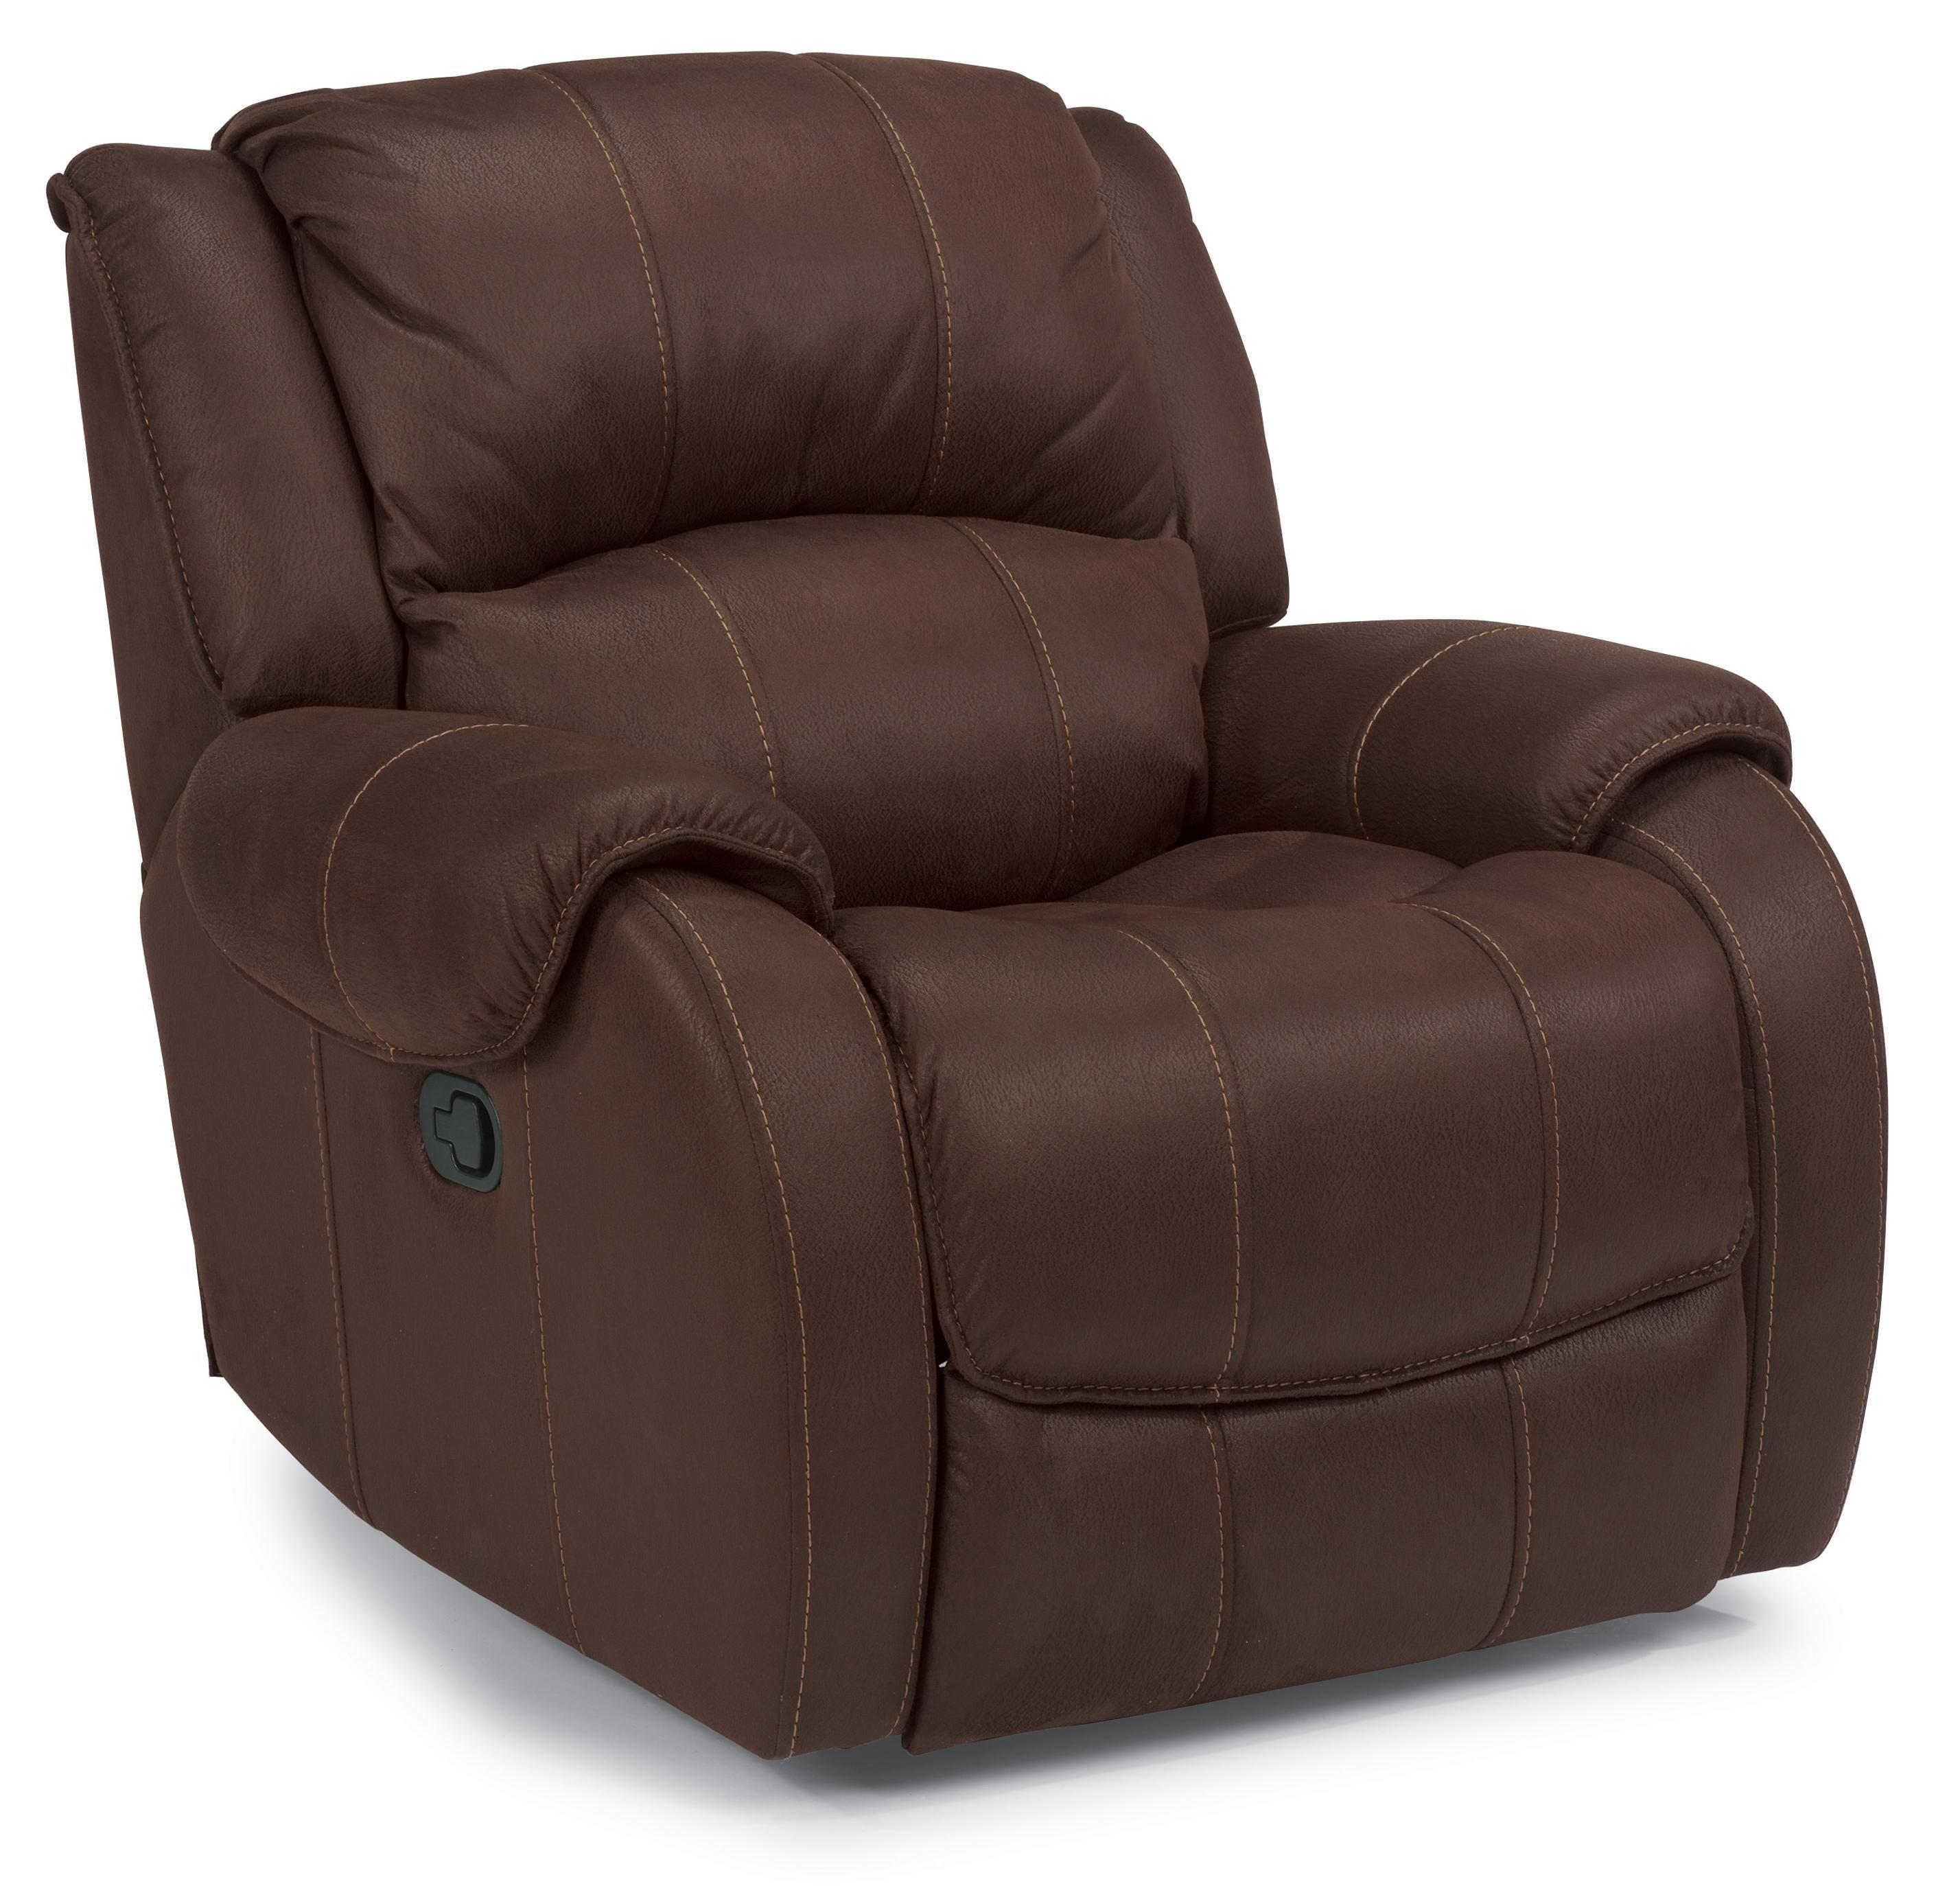 Flexsteel Furniture Latitudes Collection Pure Comfort